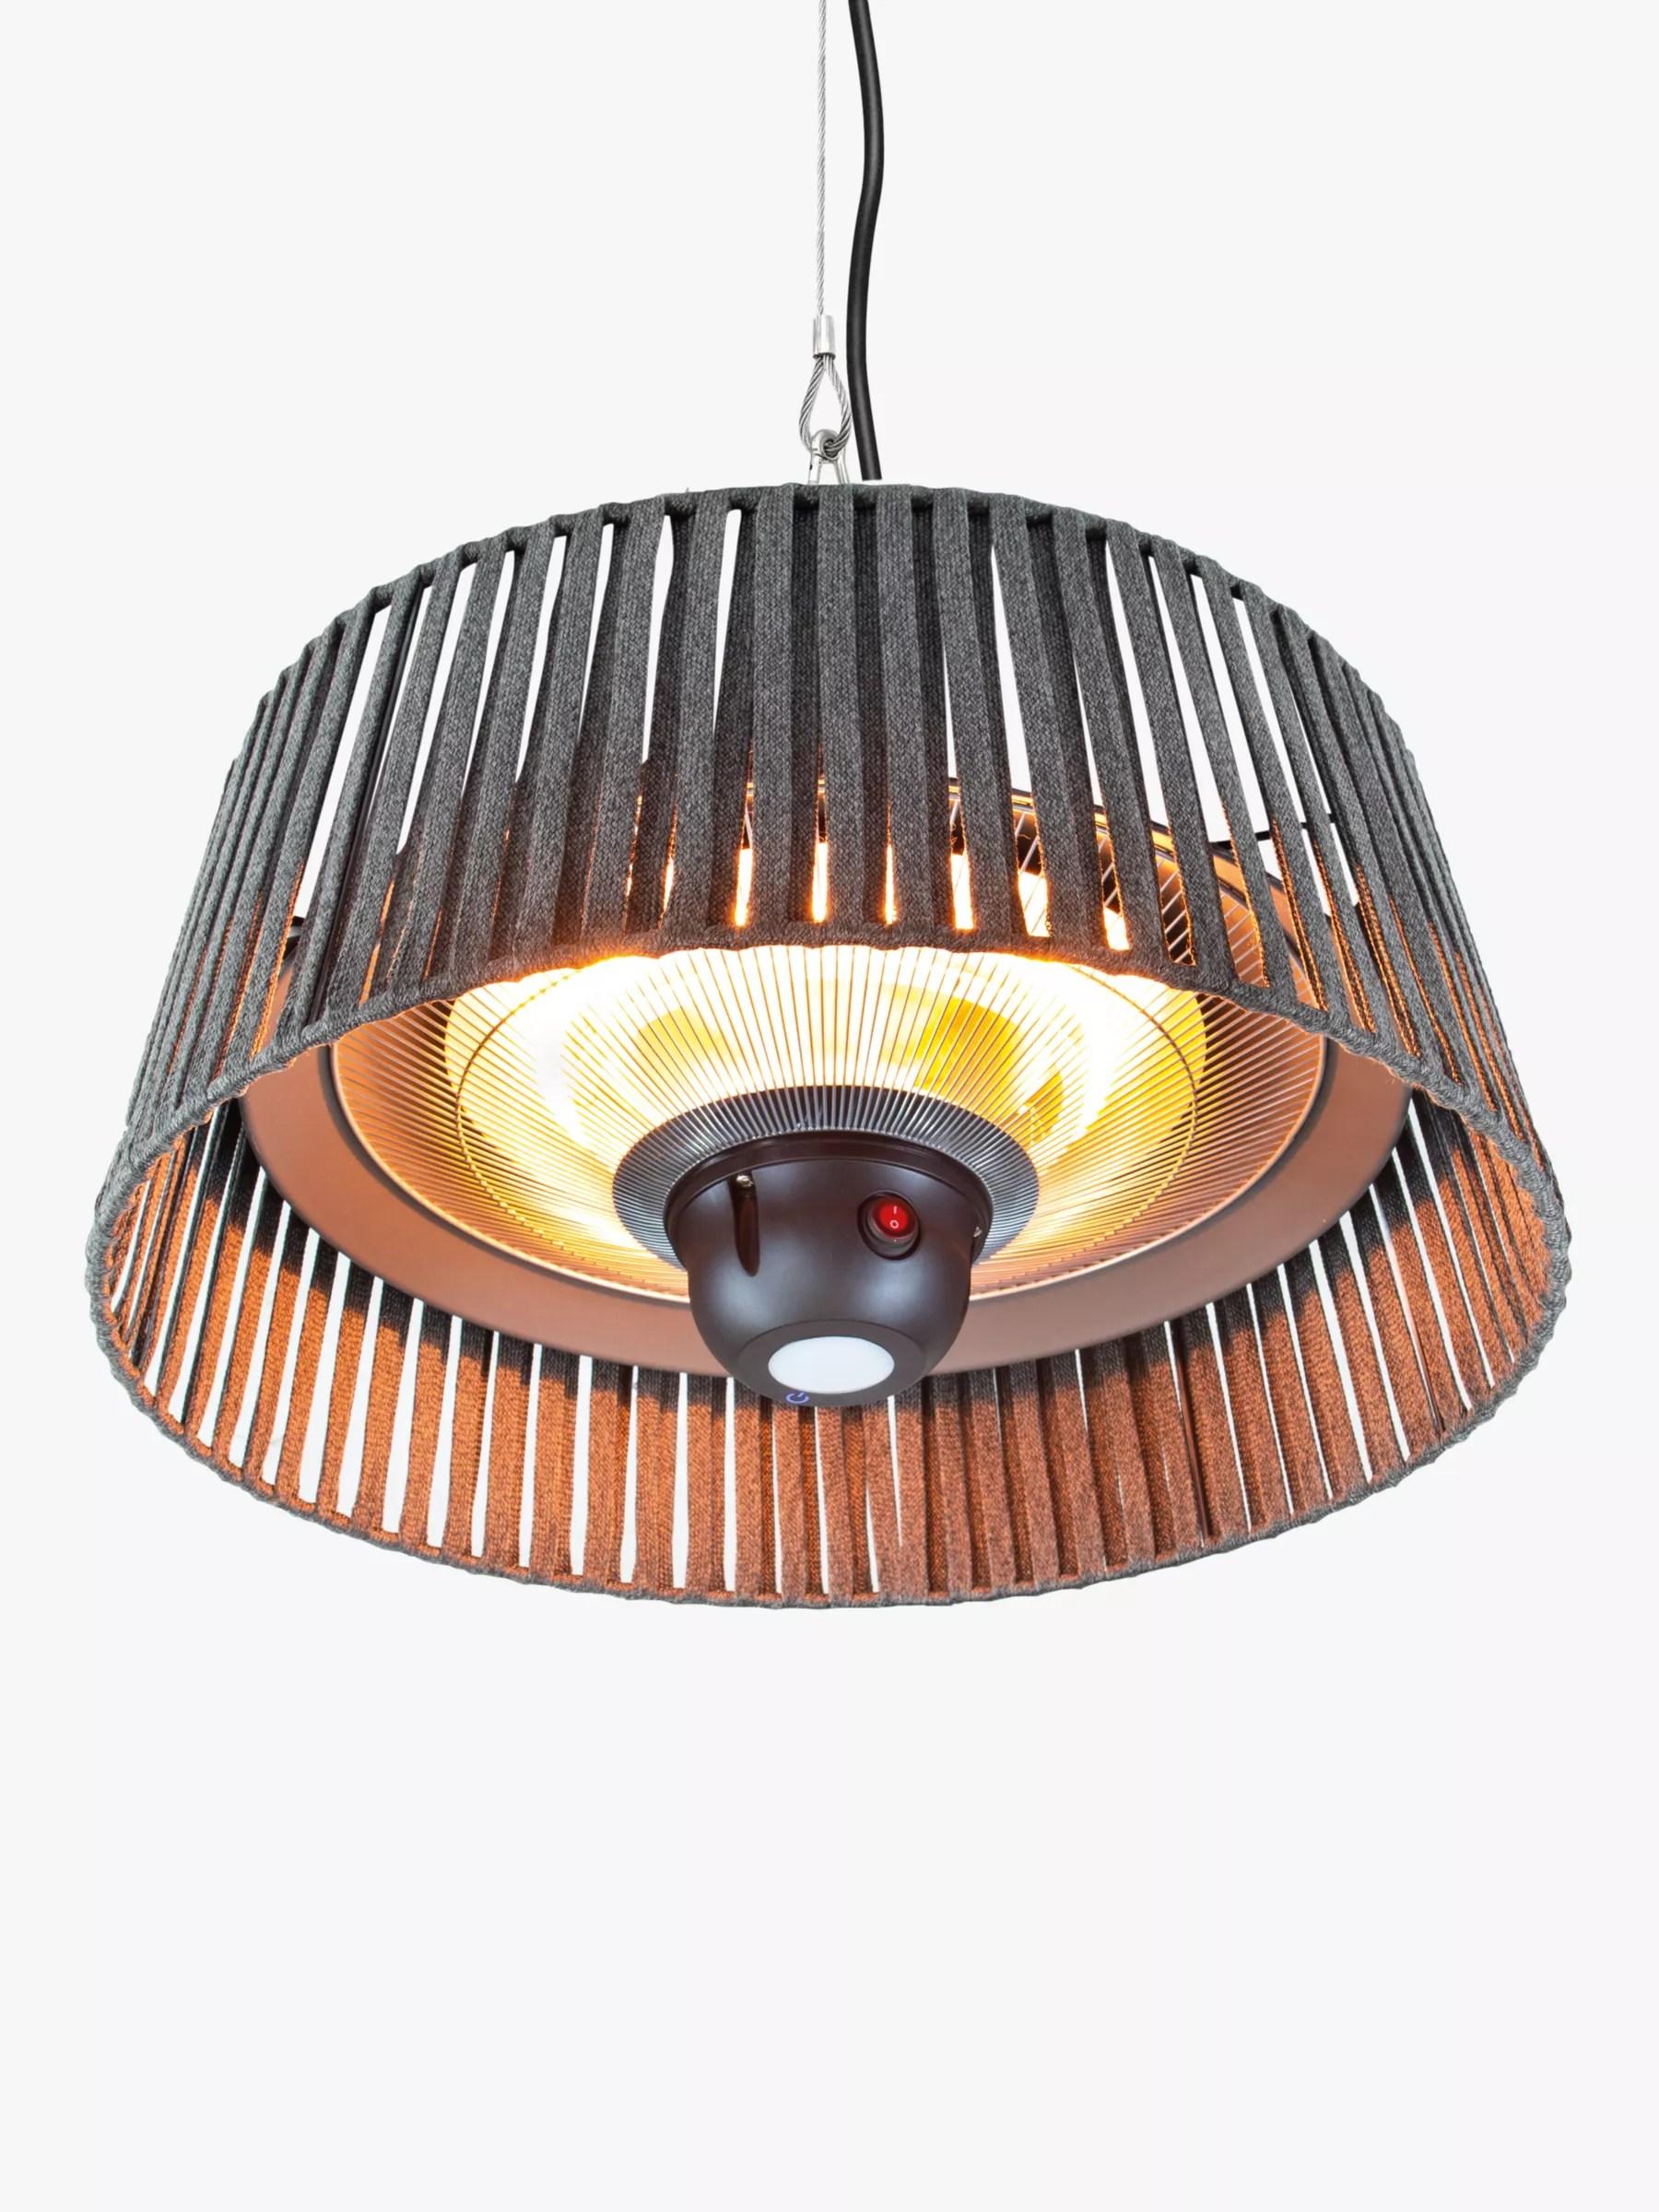 kettler kalos plush hanging pendant electric patio heater grey